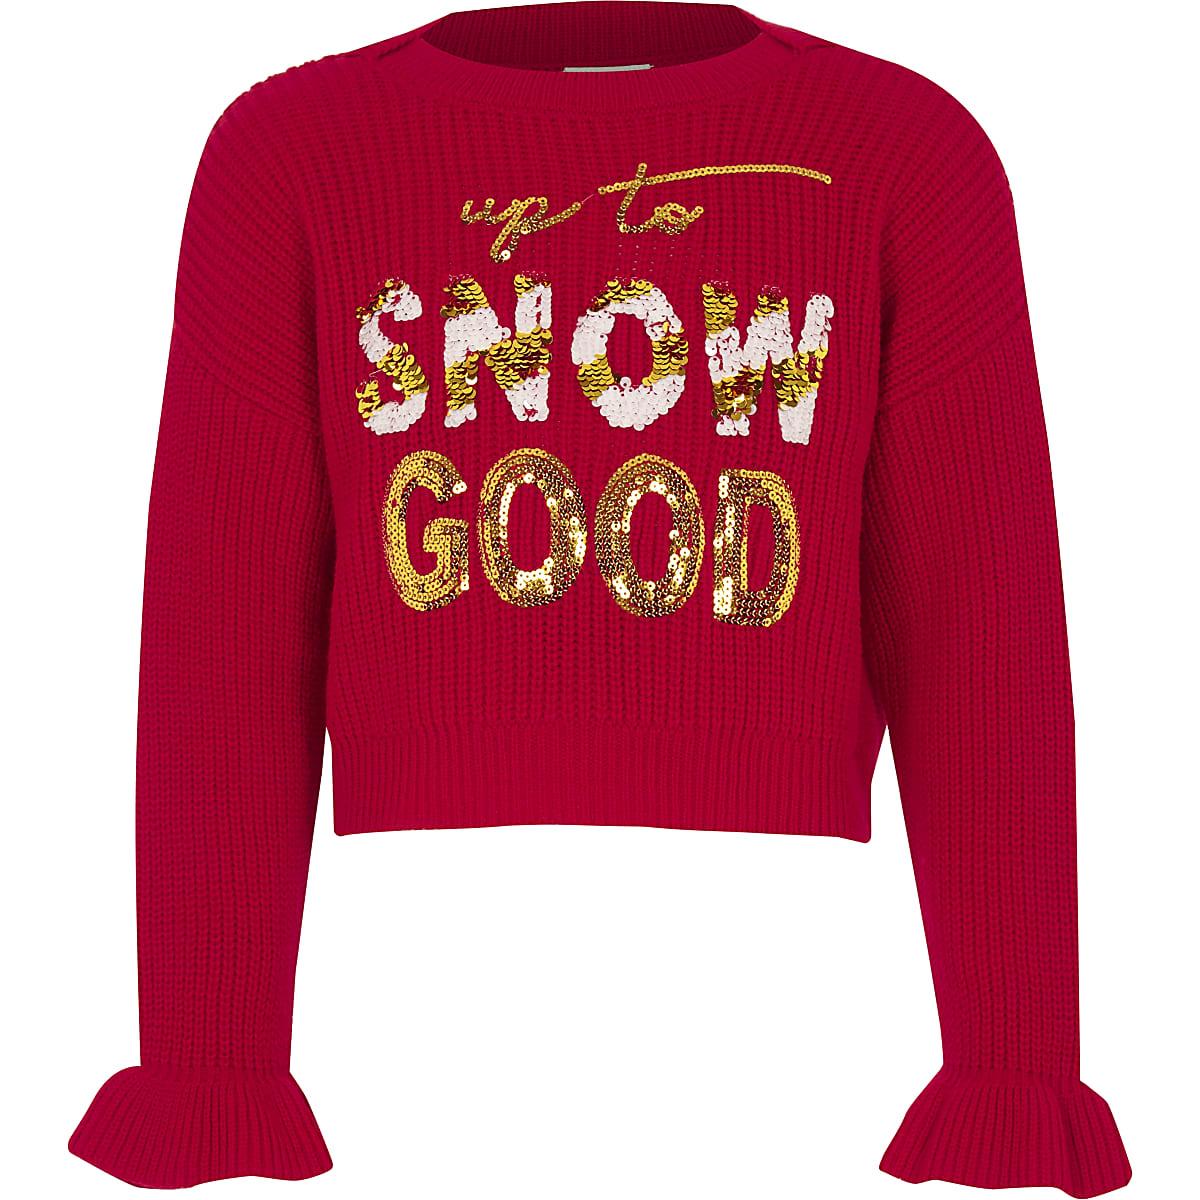 Girls red 'Snow good' Christmas sweater